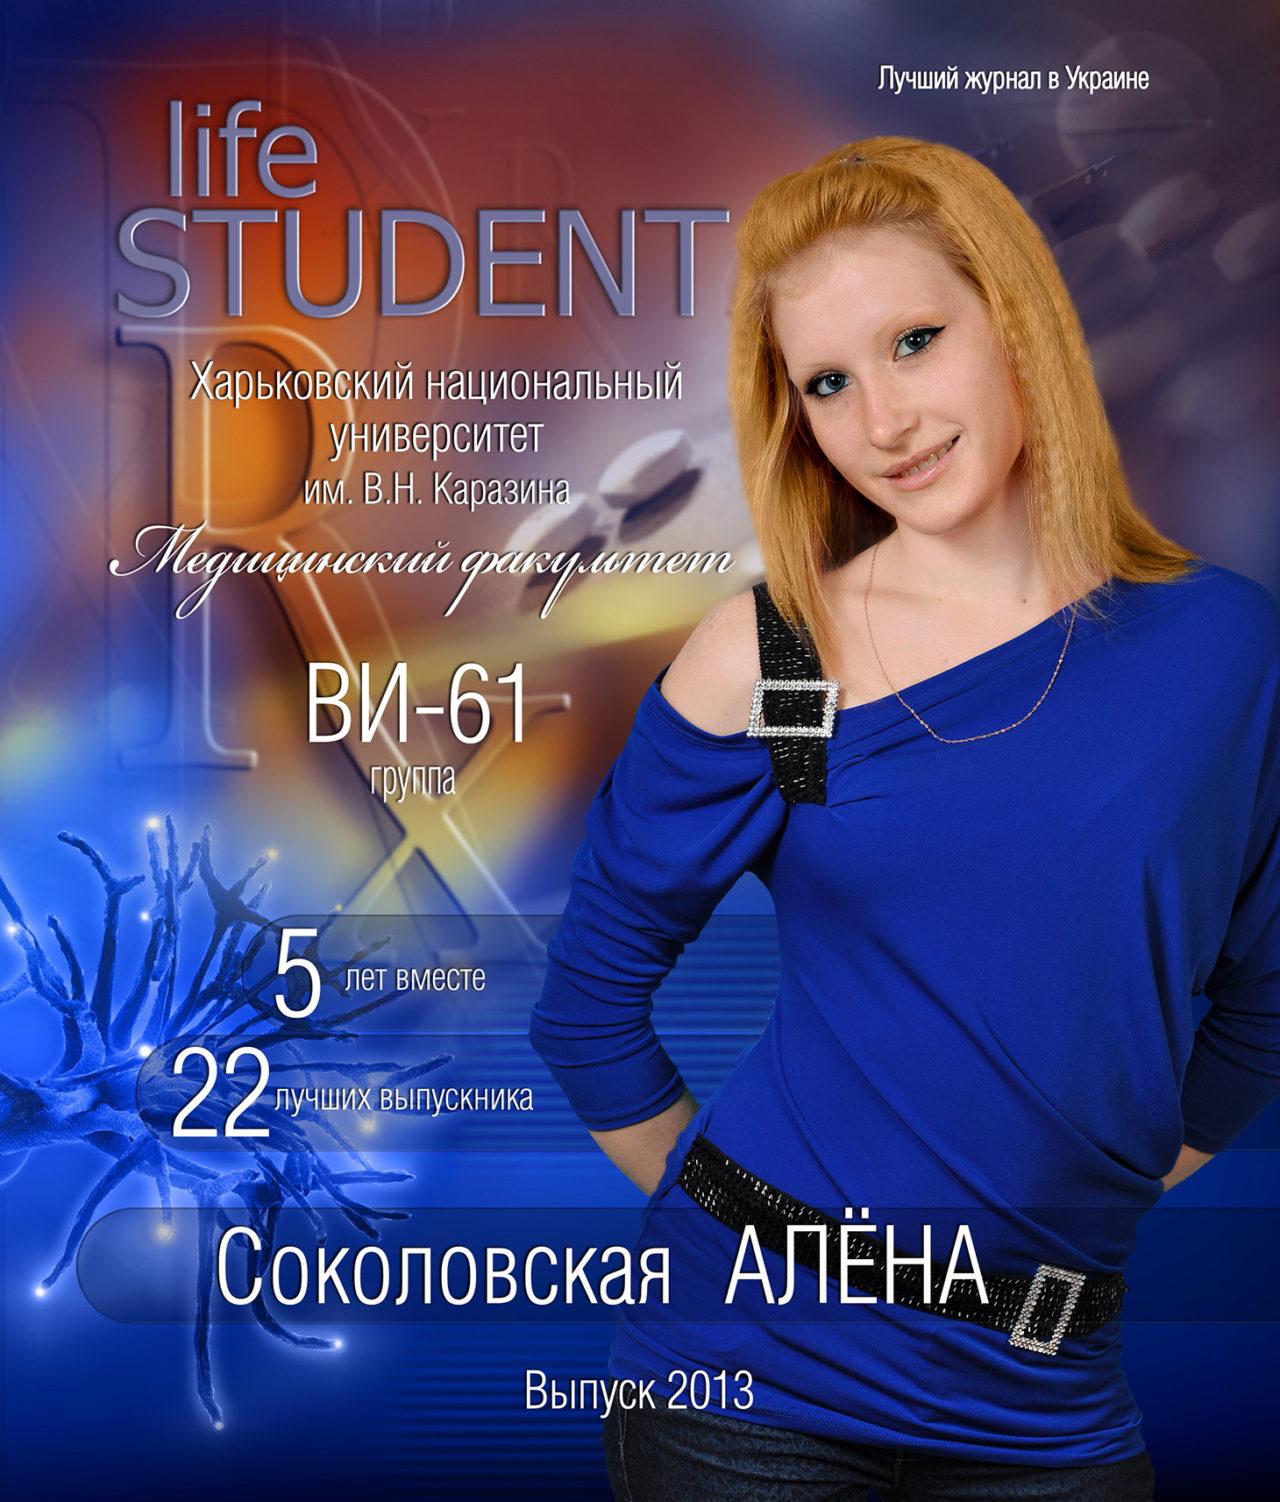 https://school-photo.com.ua/wp-content/uploads/2017/08/0001-2-1280x1502.jpg